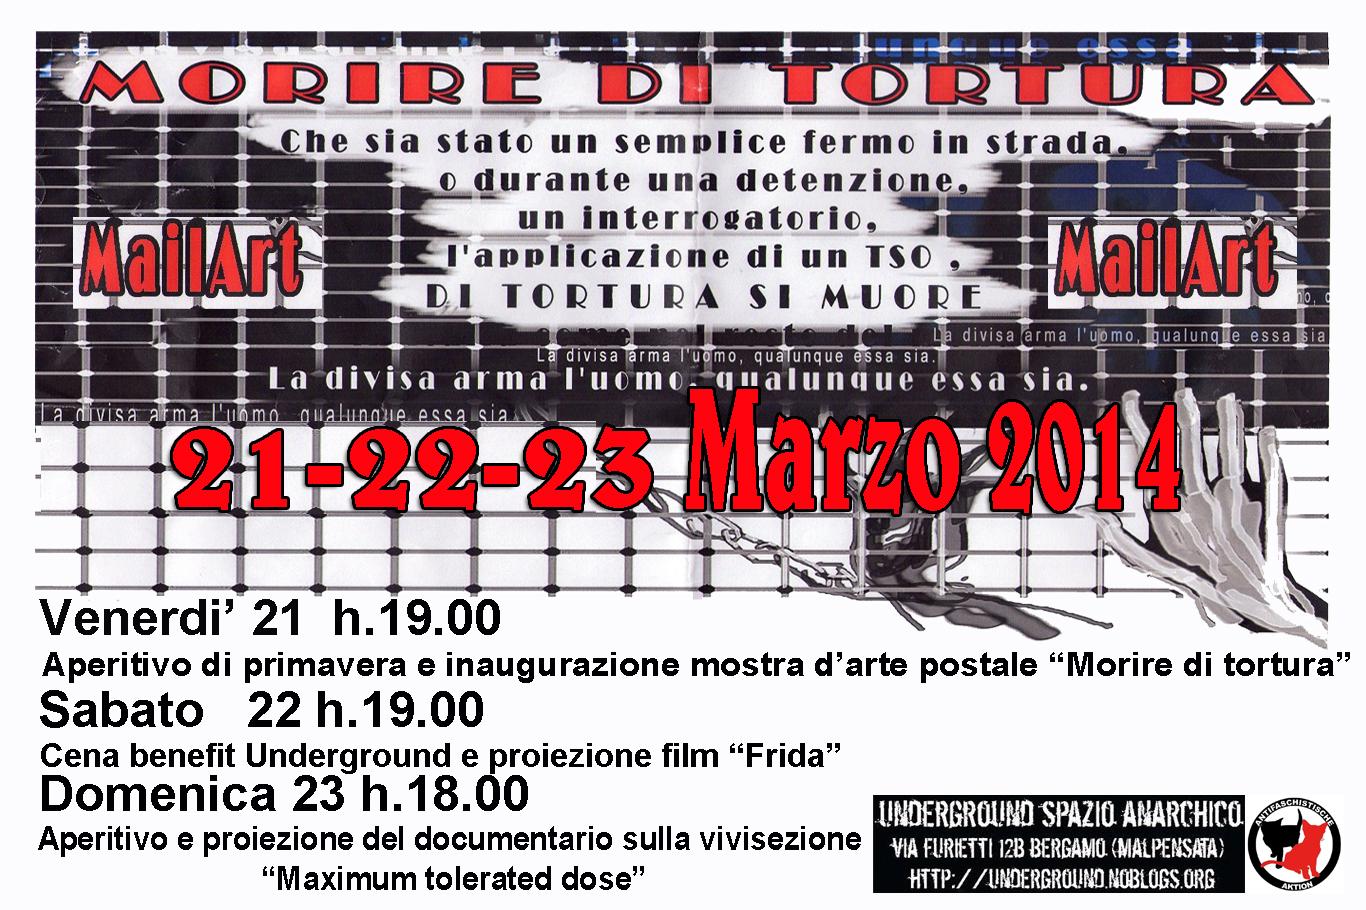 2014_03_22_morire_tortura